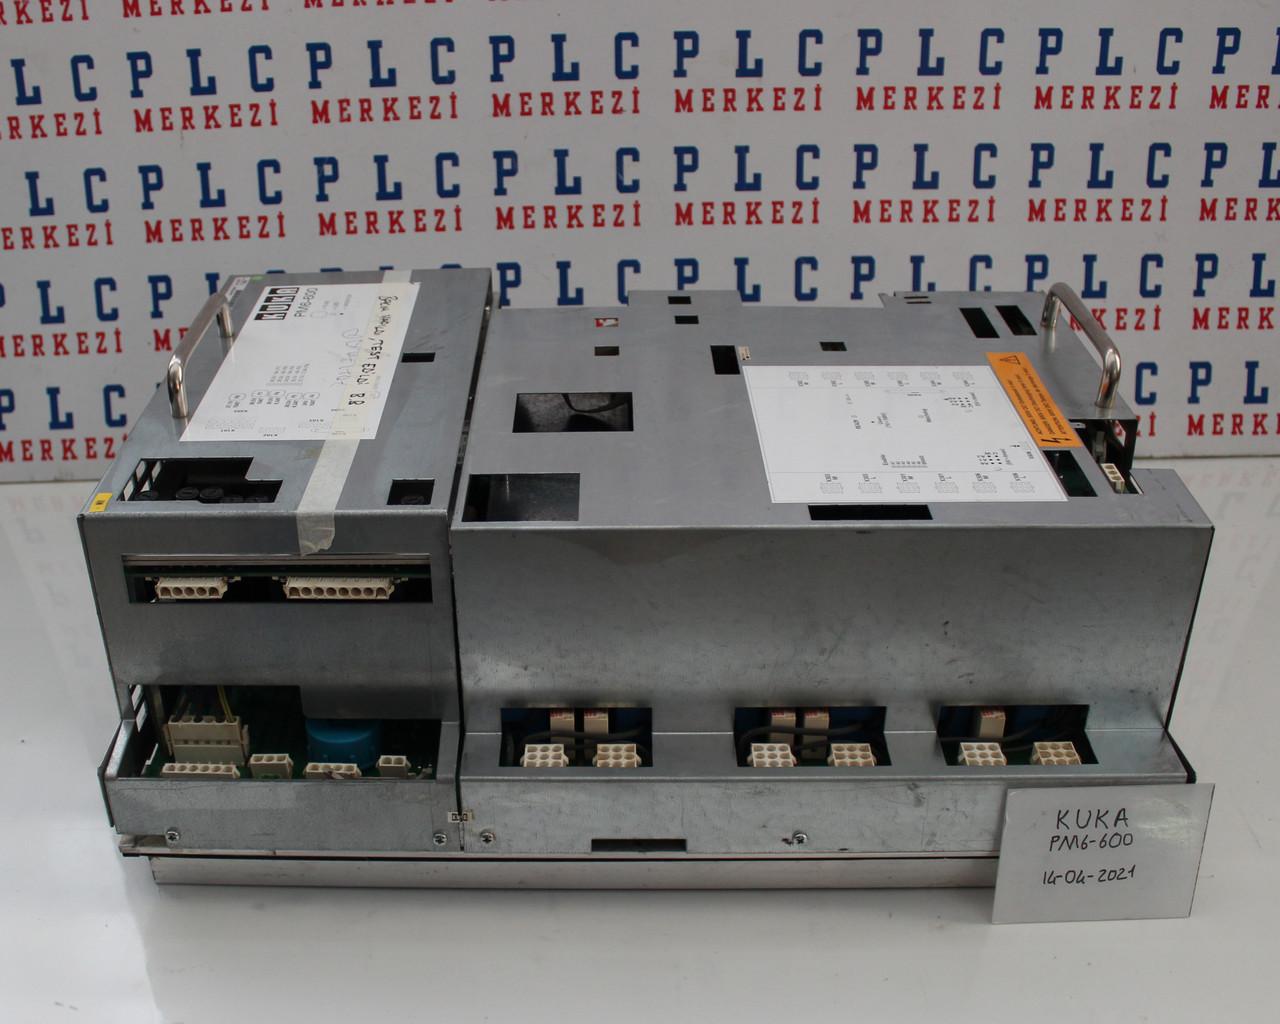 PM6-600,PM6-600 KUKA SERVO CONTROL CONTROLLER